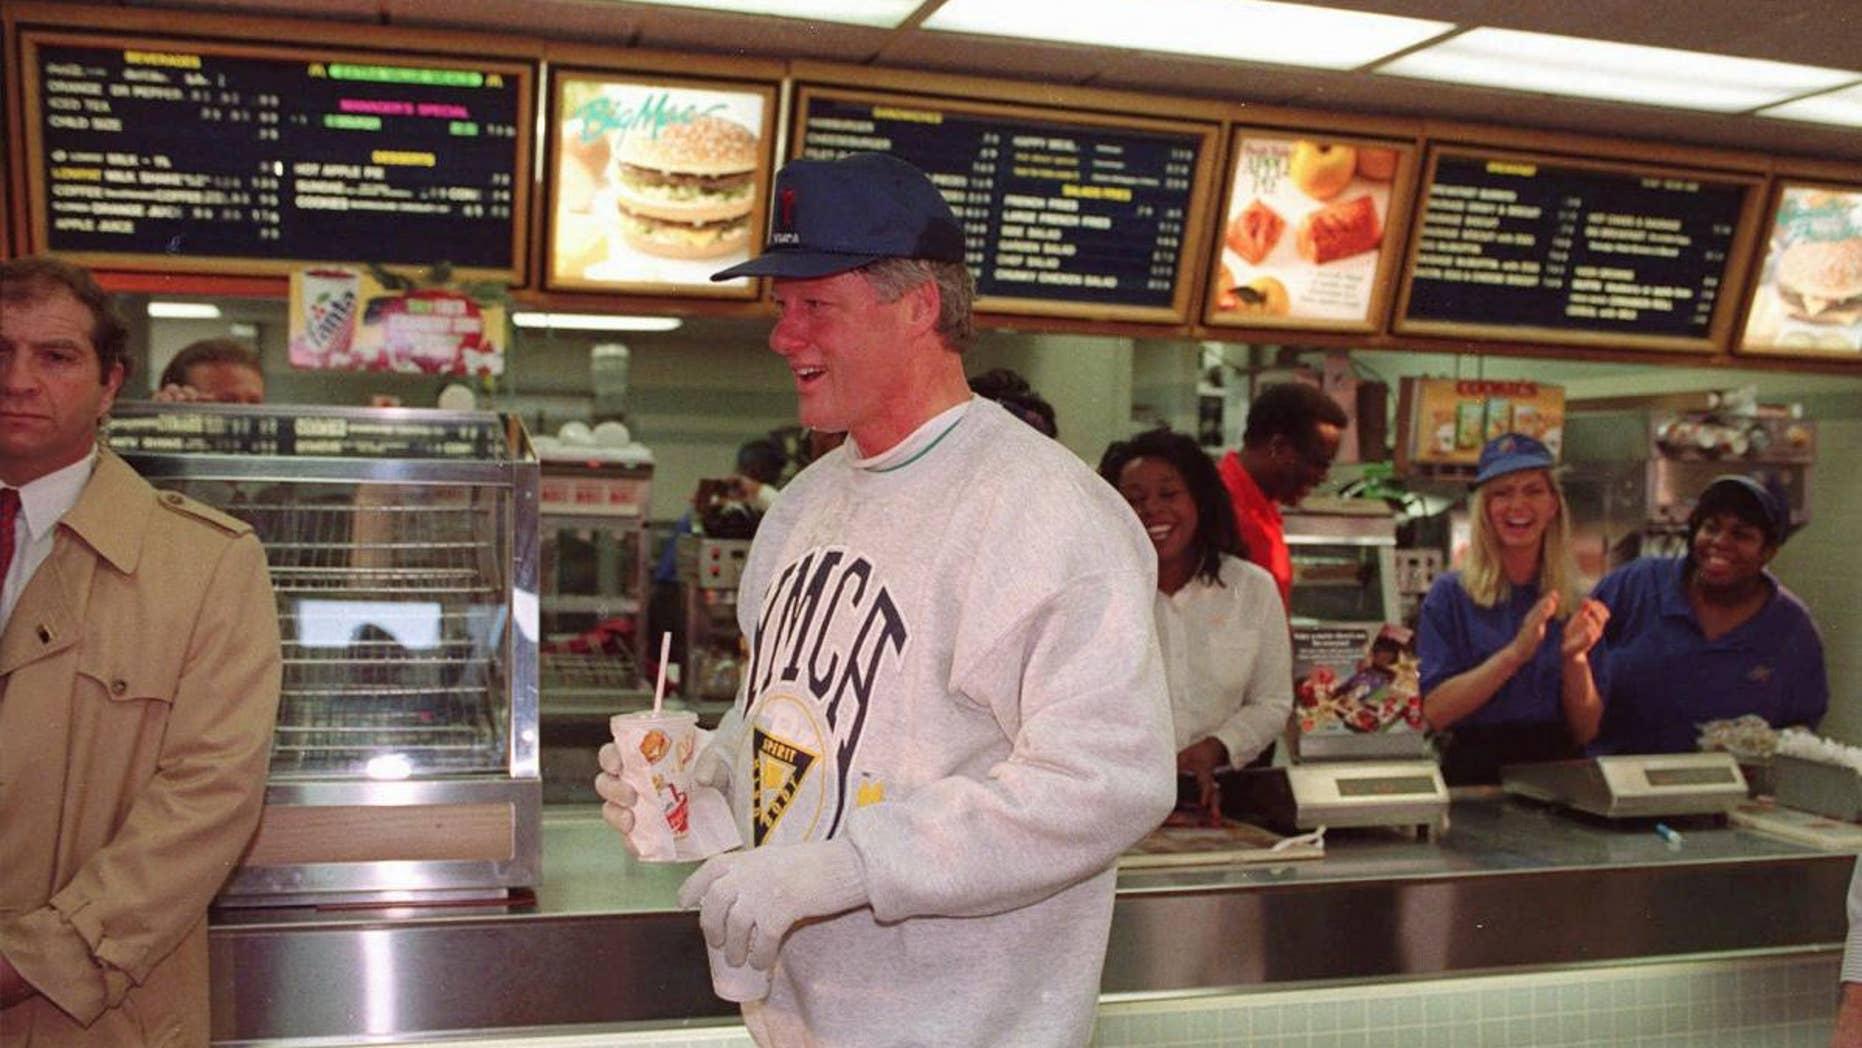 Then-President Clinton leaves an Arkansas McDonald's, sans Big Mac, in this 1993 AP File Photo